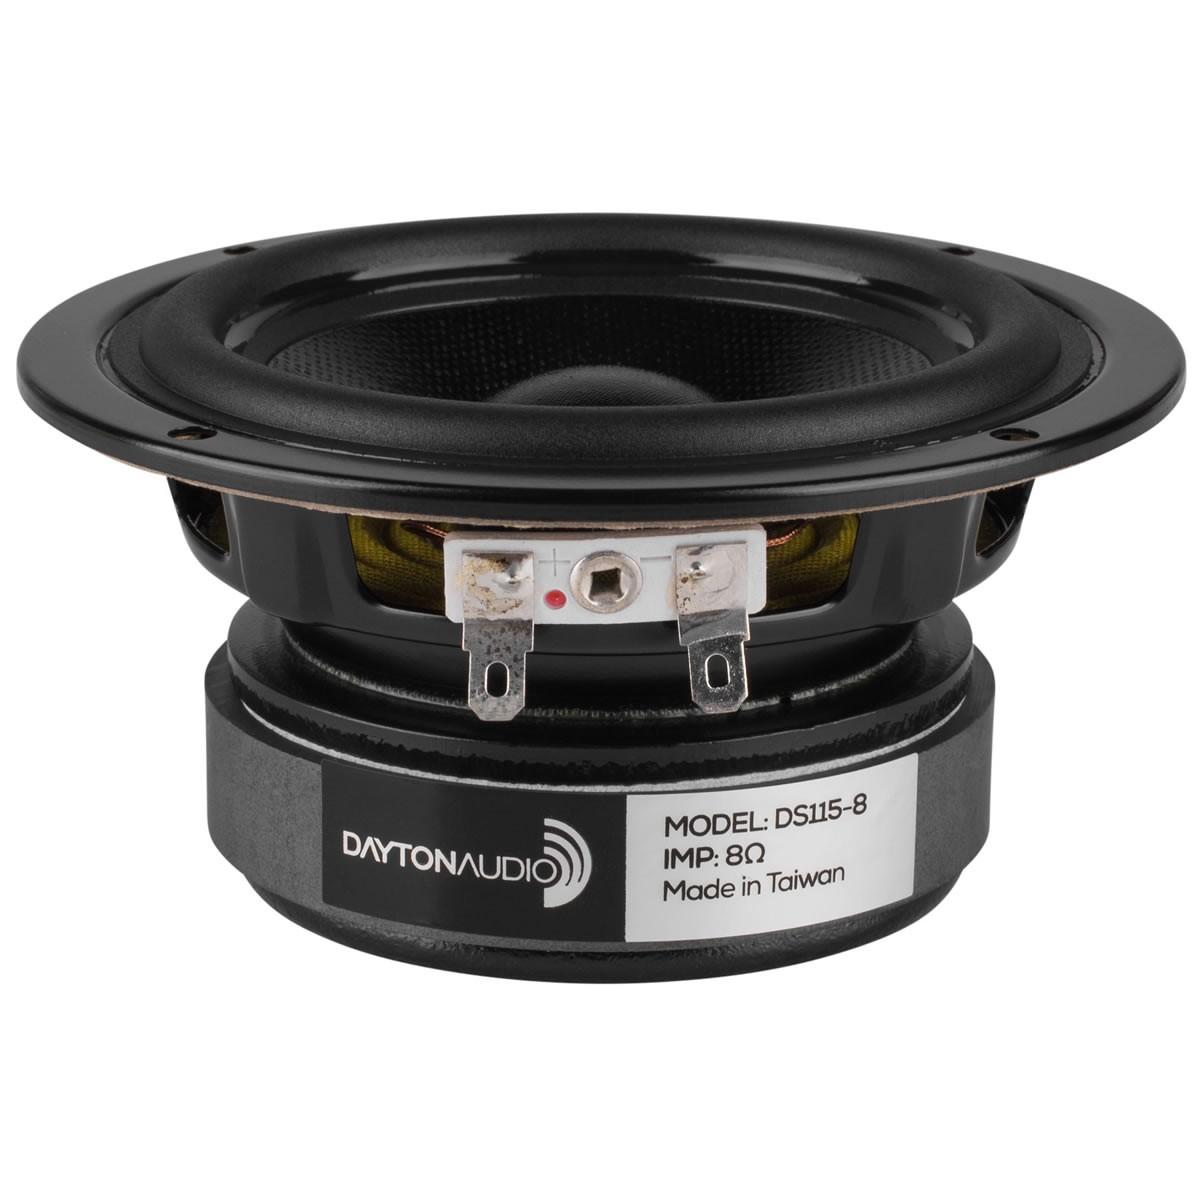 DAYTON AUDIO DS115-8 Designer Series Haut-Parleur Bas Médium 35W 8 Ohm 85dB 60Hz - 8000Hz Ø10cm